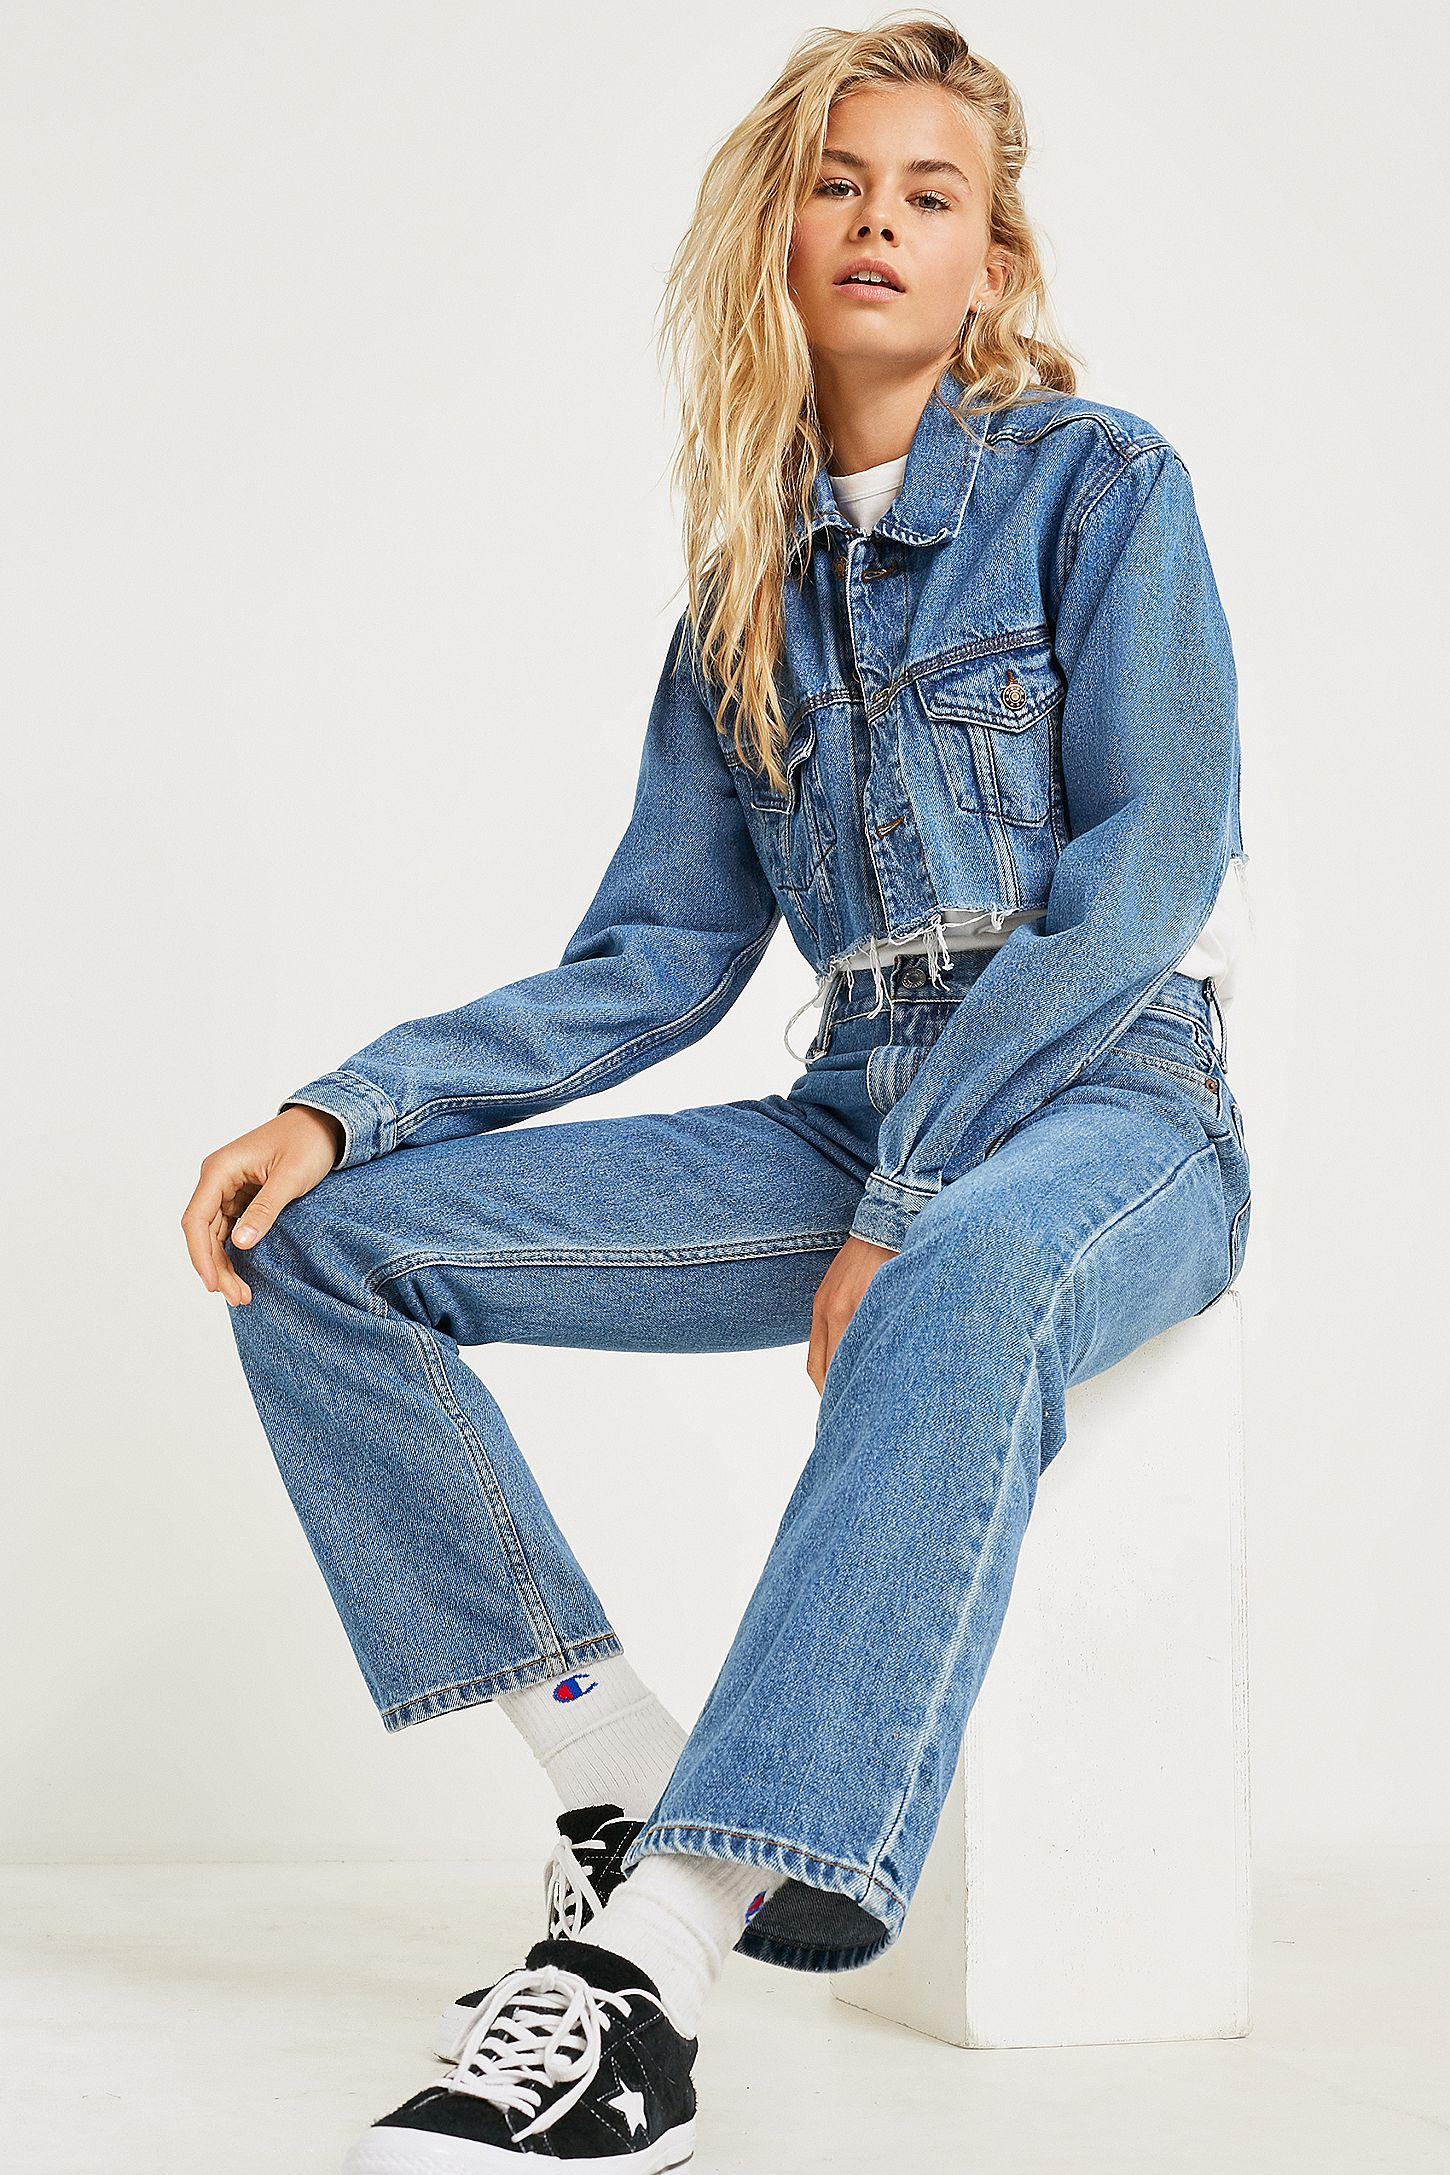 4b76ce0b Urban Renewal Vintage Levi's Light + Mid-Wash Jeans | Urban ...